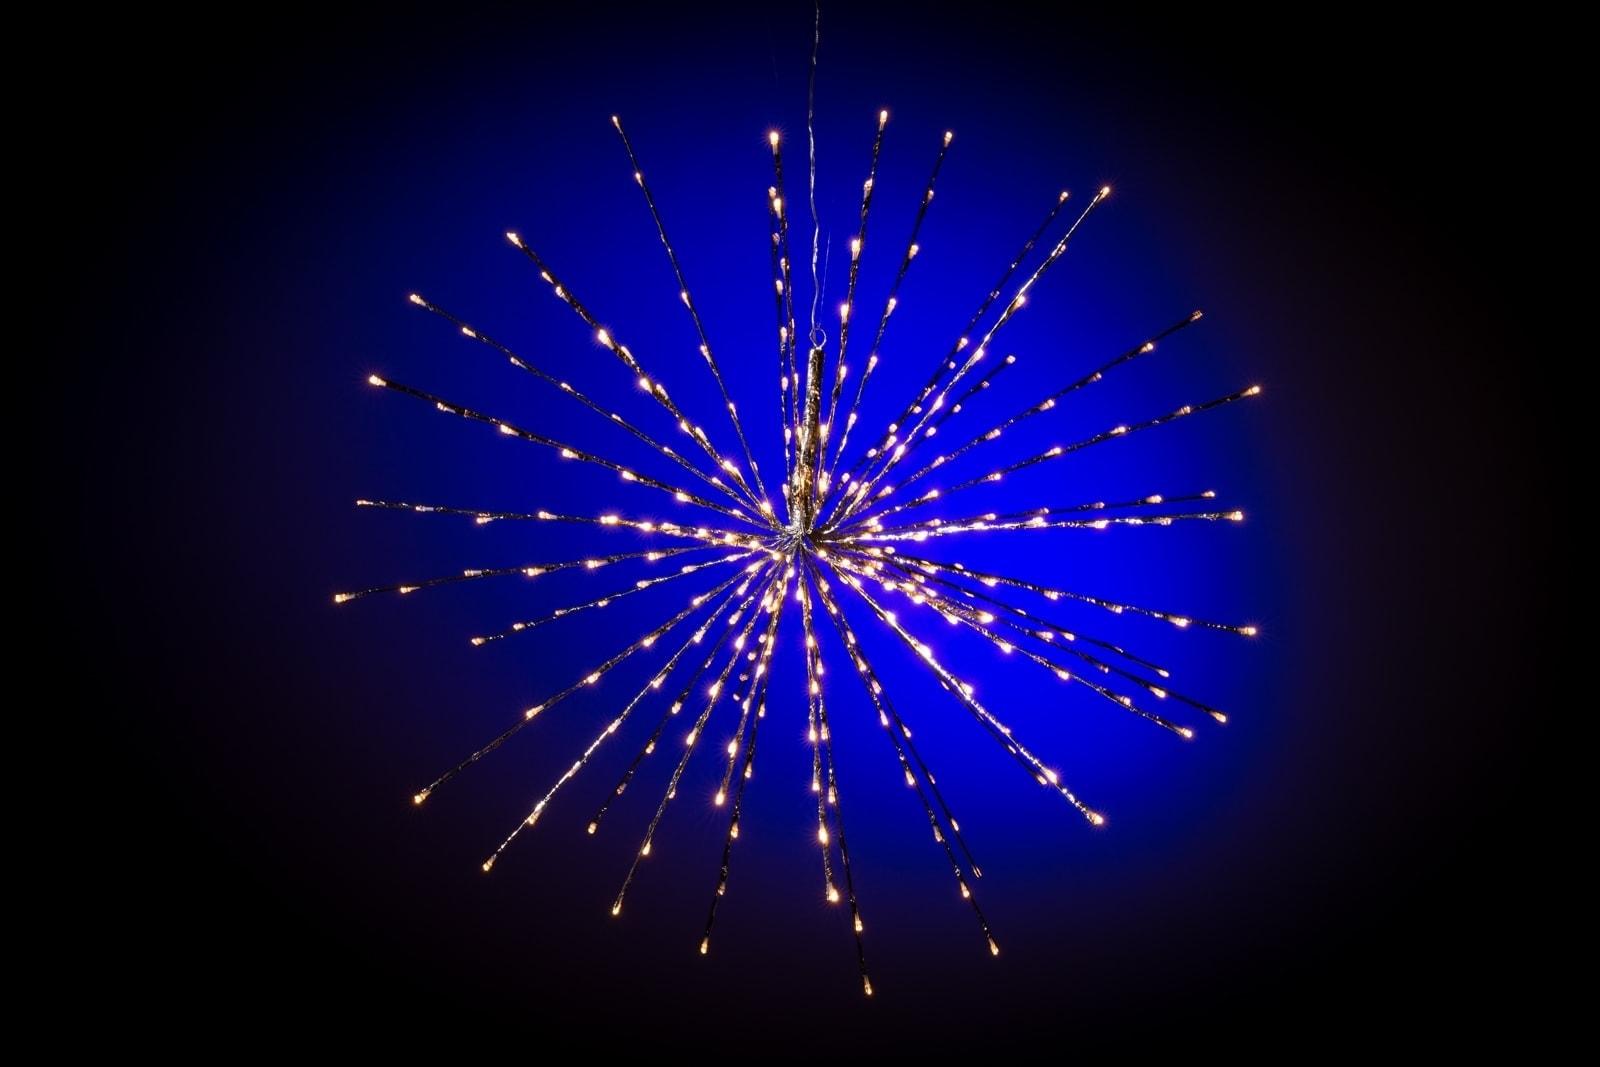 3d Kerstster Verlichting Met Flash Effect Modern Warm Wit O 70 Cm 160 Lampjes